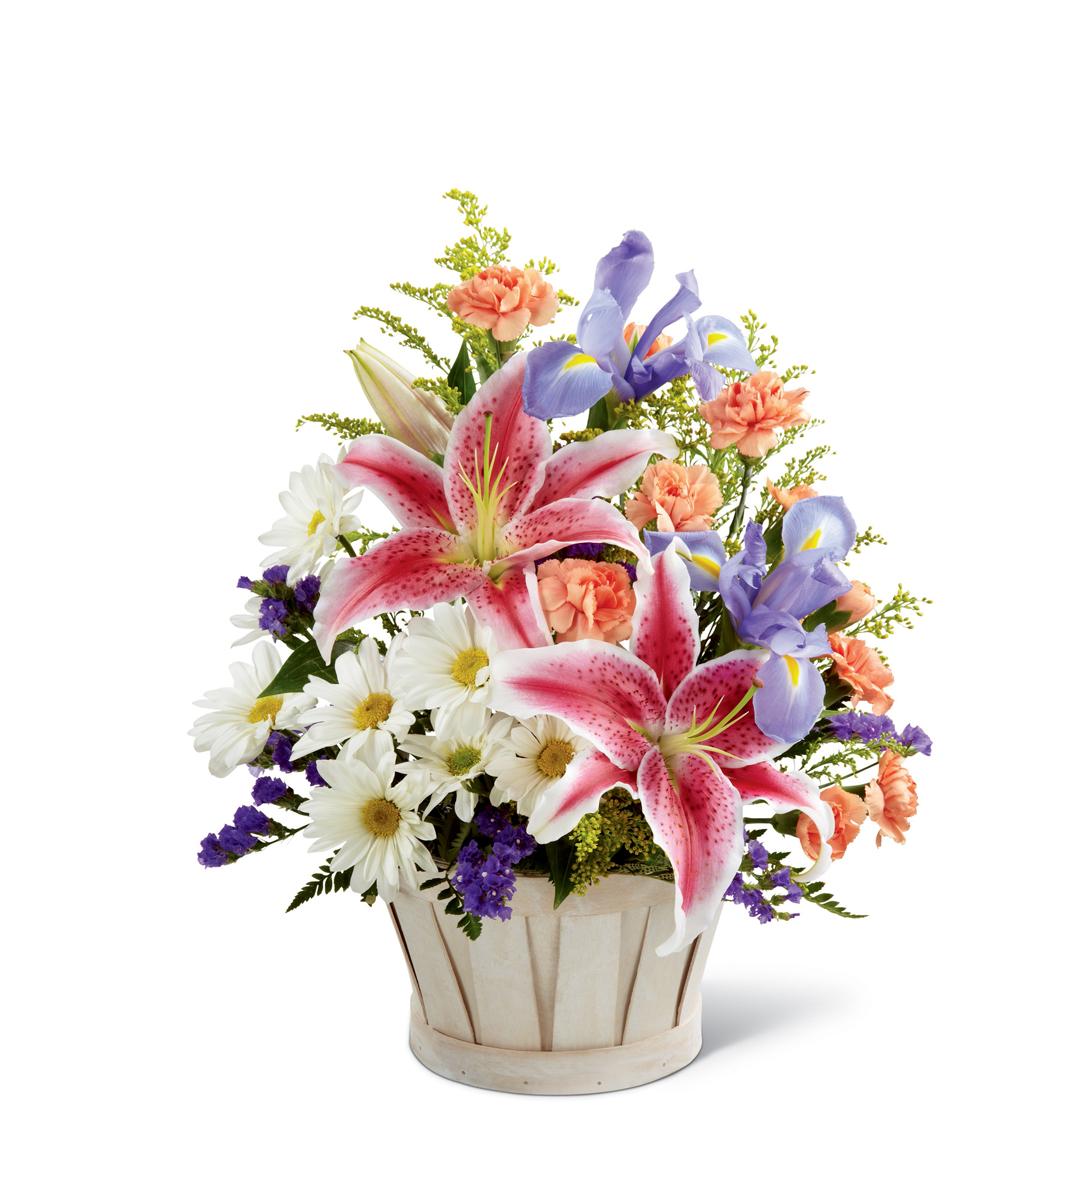 Om A Hindu Religious Symbol Brampton On Florist